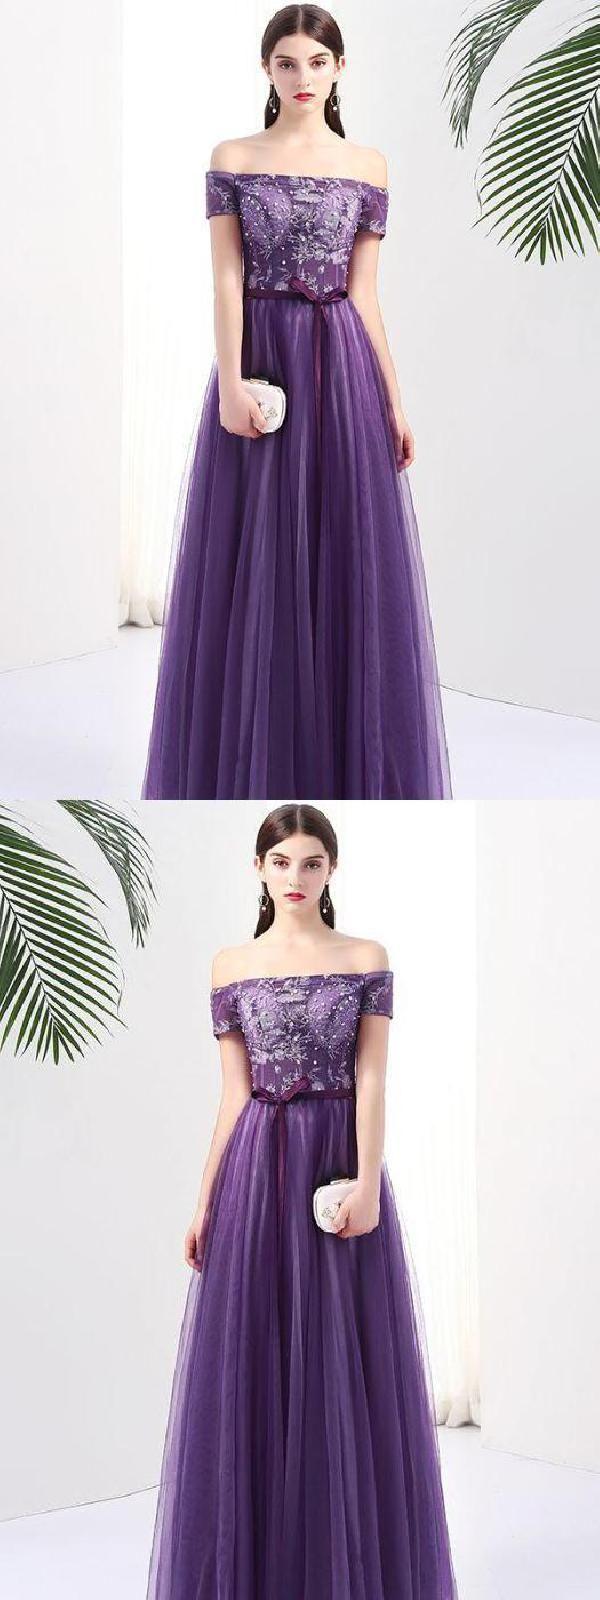 Chic grape prom dress aline off shoulder applique prom dress